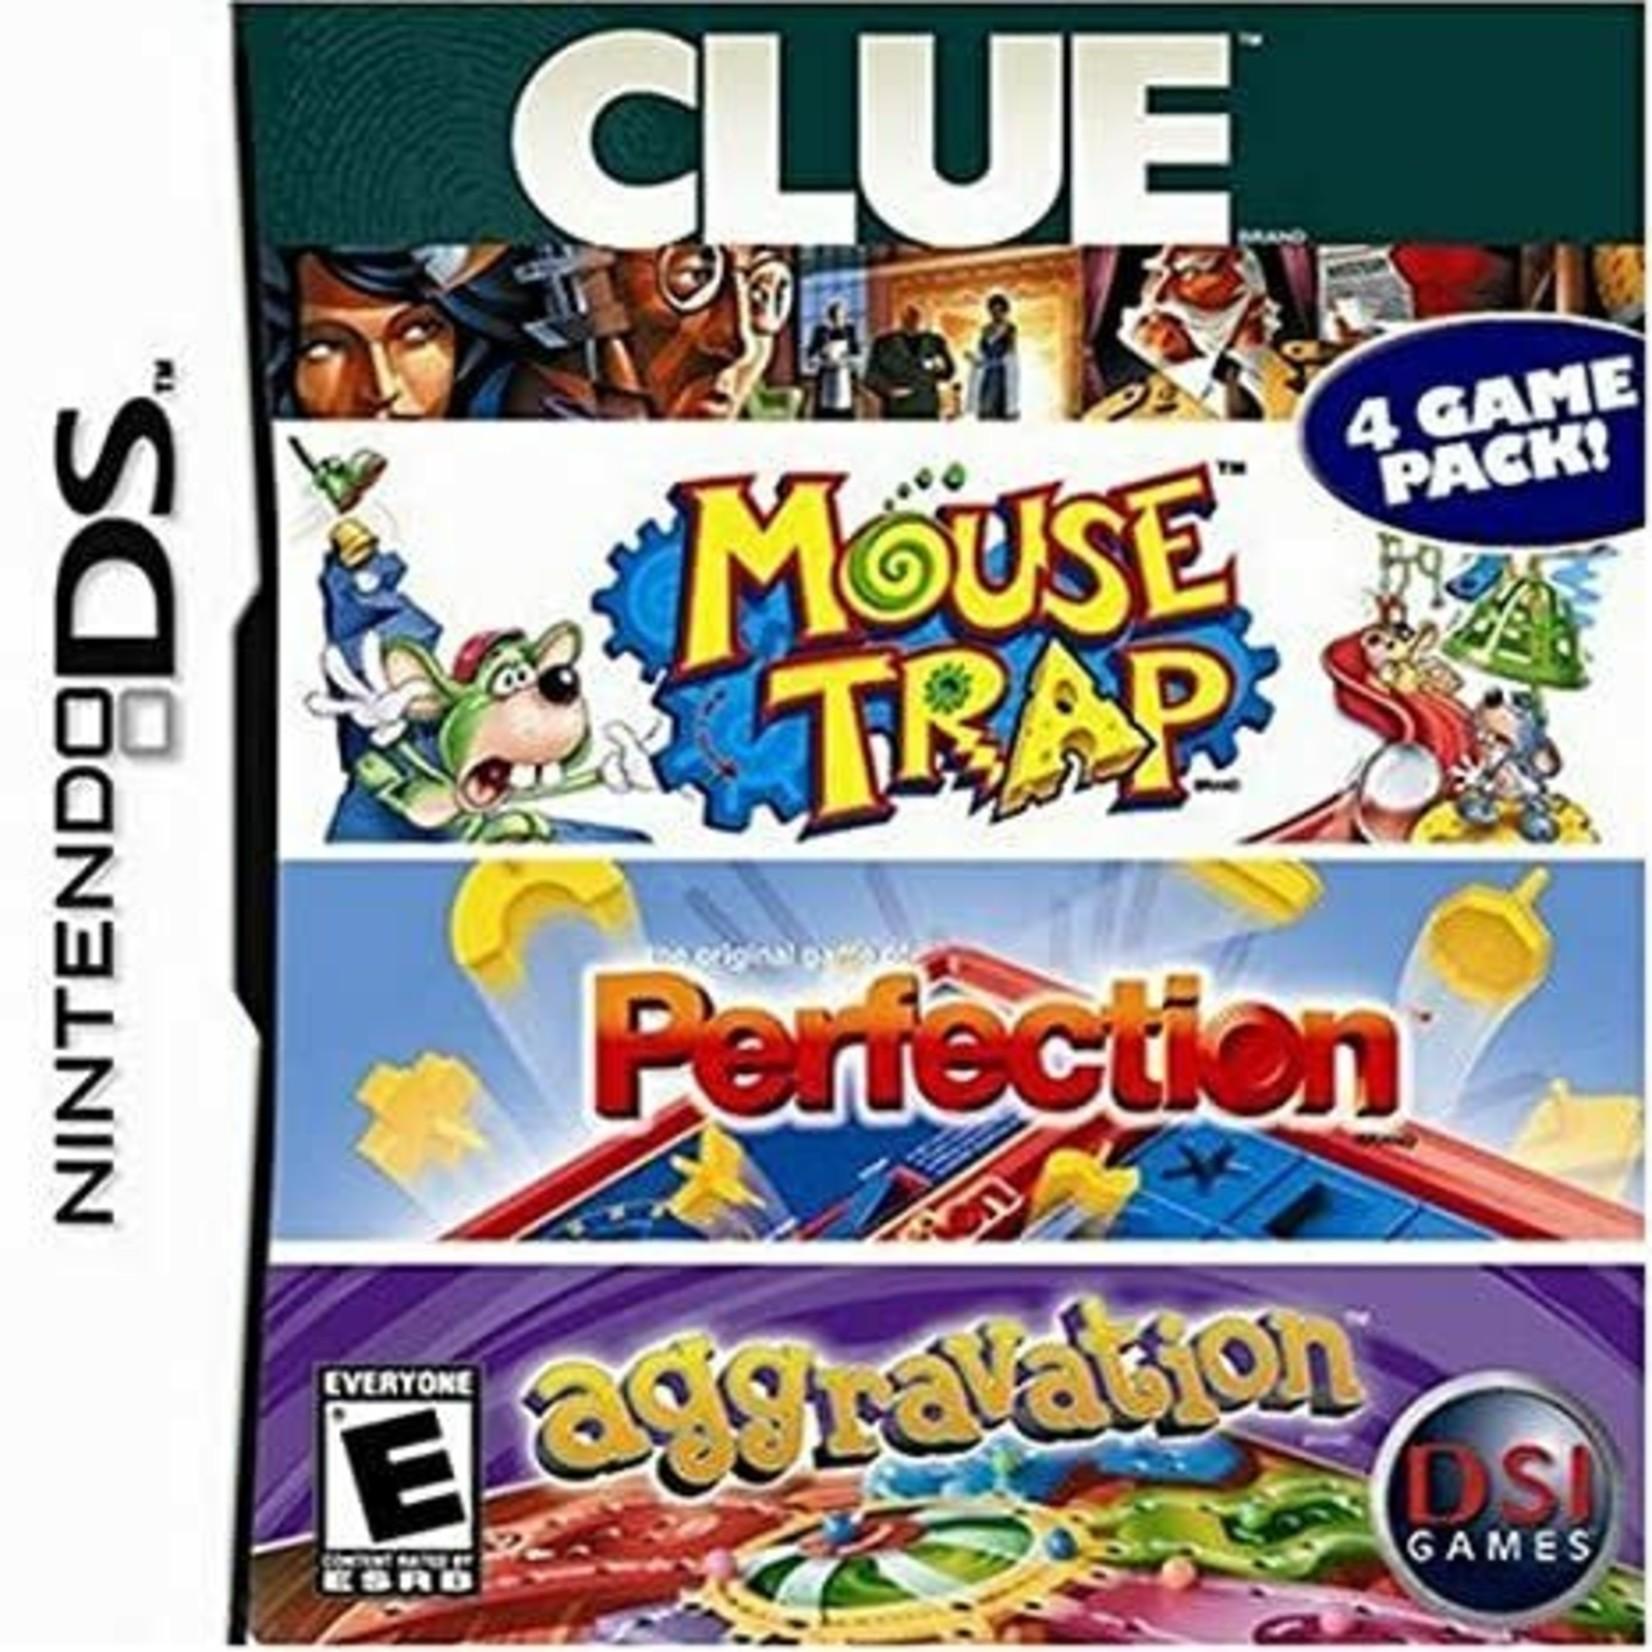 DSU-CLUE/MOUSE TRAP/PERFECTION/AGGRAVATION